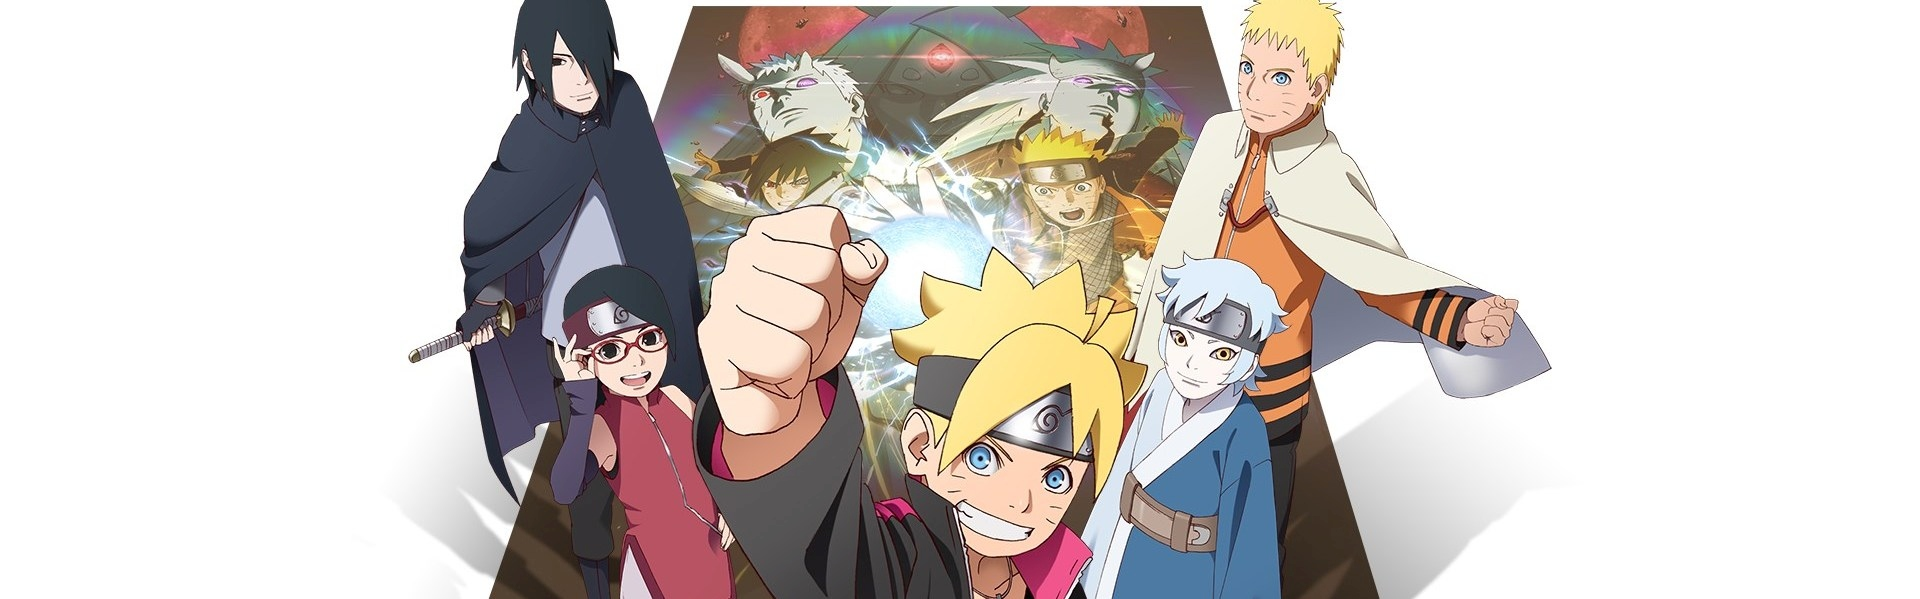 Naruto Shippuden: Ultimate Ninja Storm 4: Road to Boruto Expansion (DLC) Steam Key GLOBAL